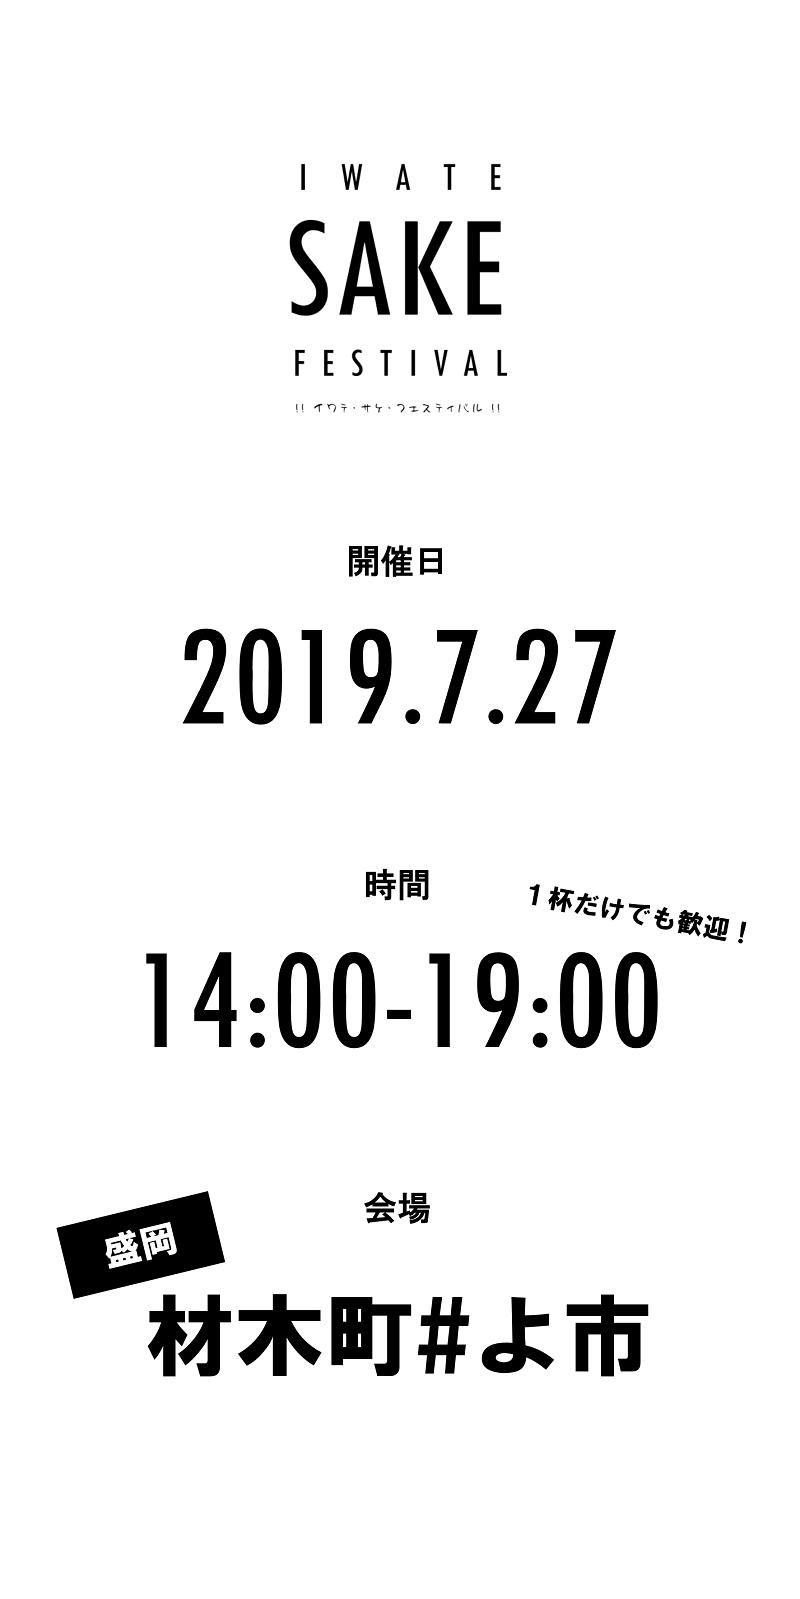 IwateSakeFestival2019_lp1